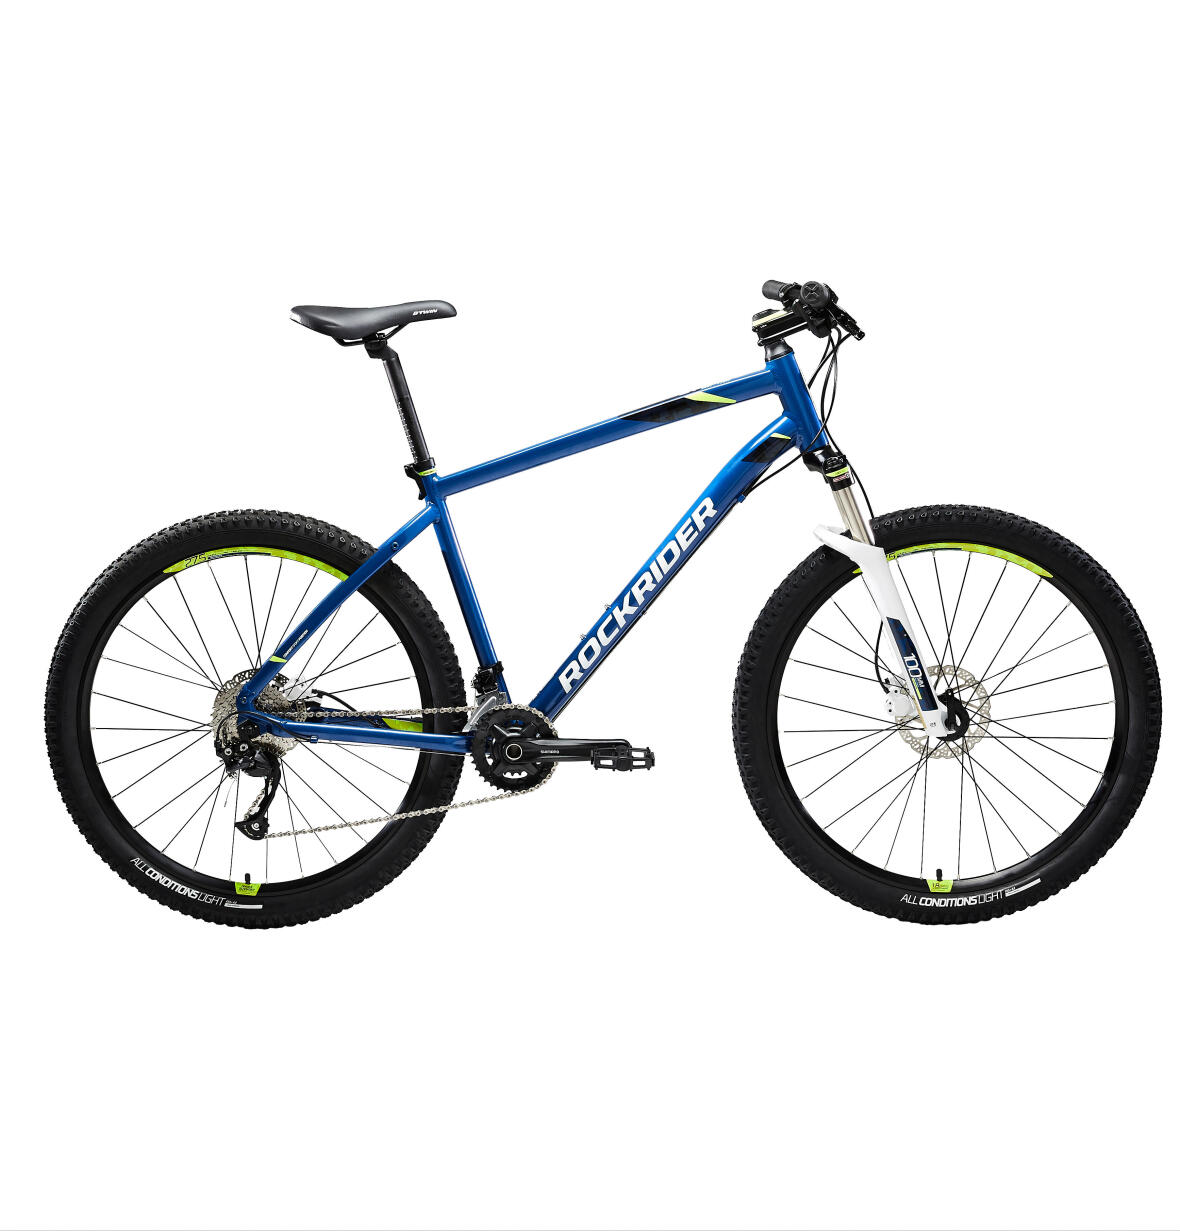 ROCKRIDER ST 540 MOUNTAIN BIKE BLUE YELLOW